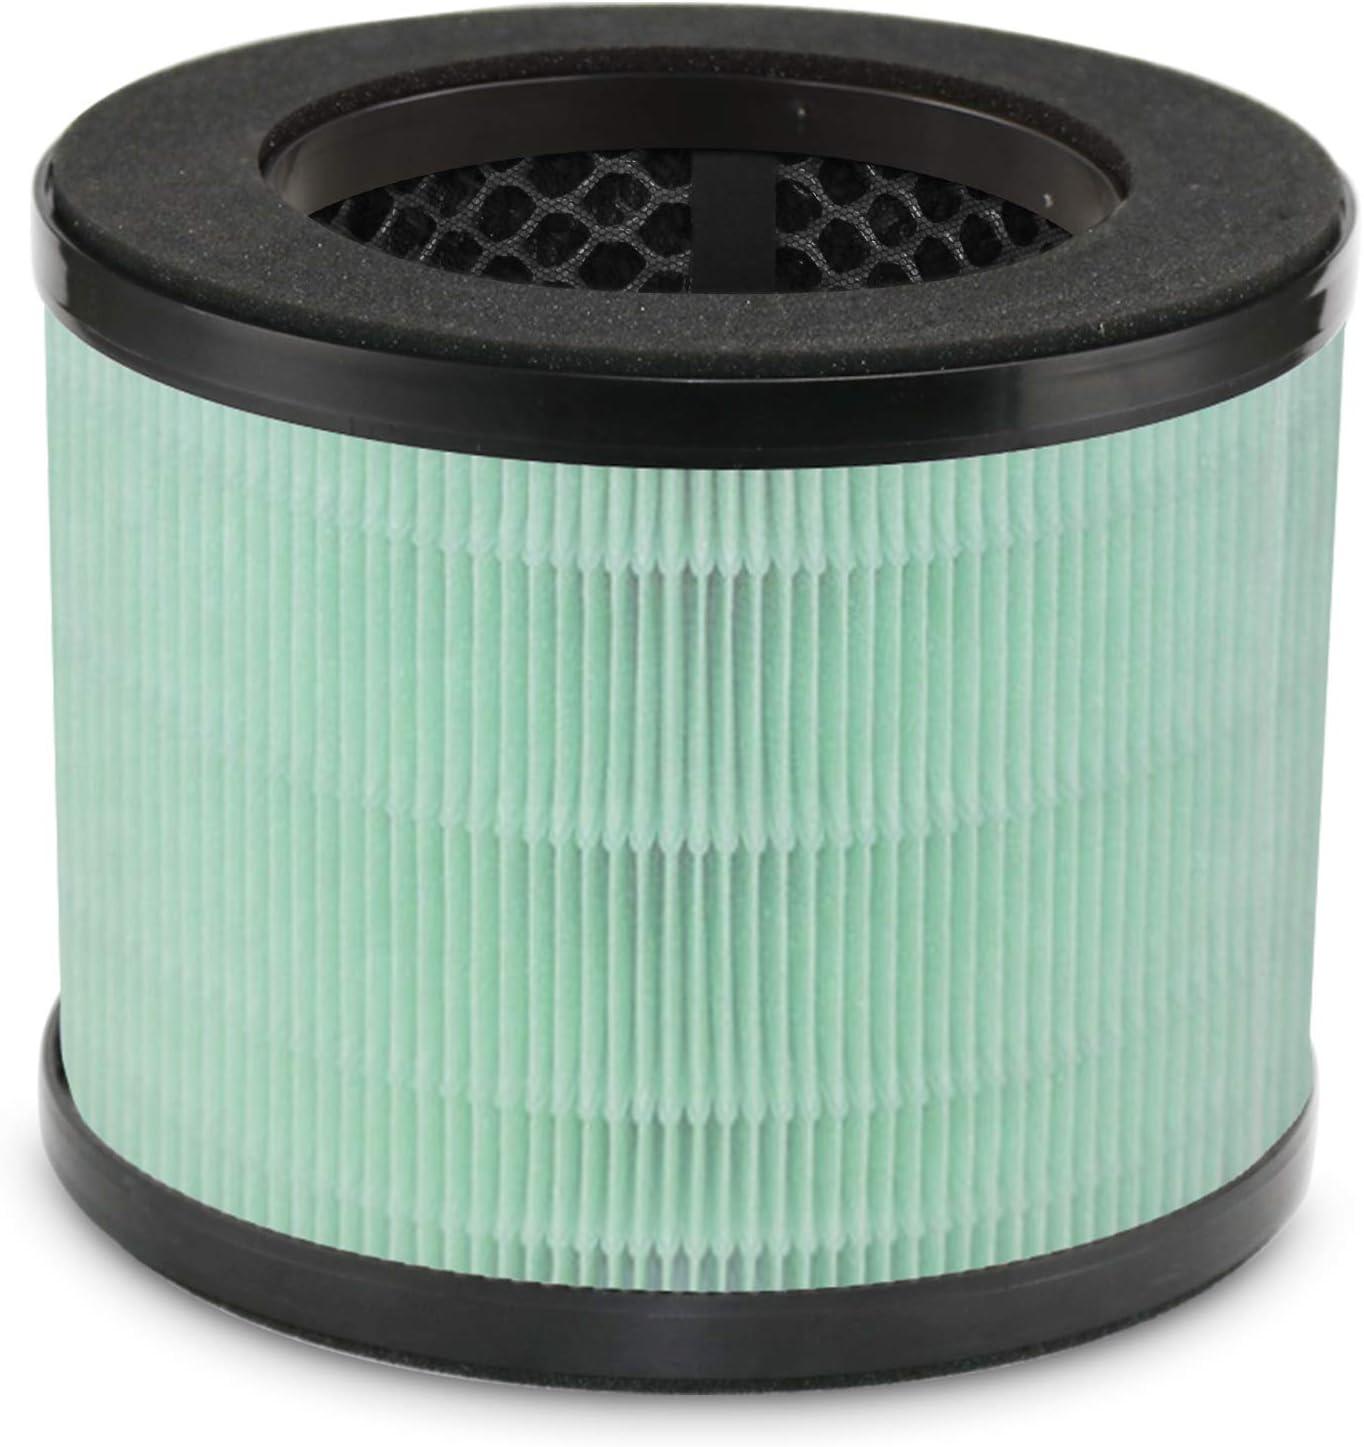 Okaysou AirMic4S Medical Grade Ultra-Duo Filter Replacement (Green)